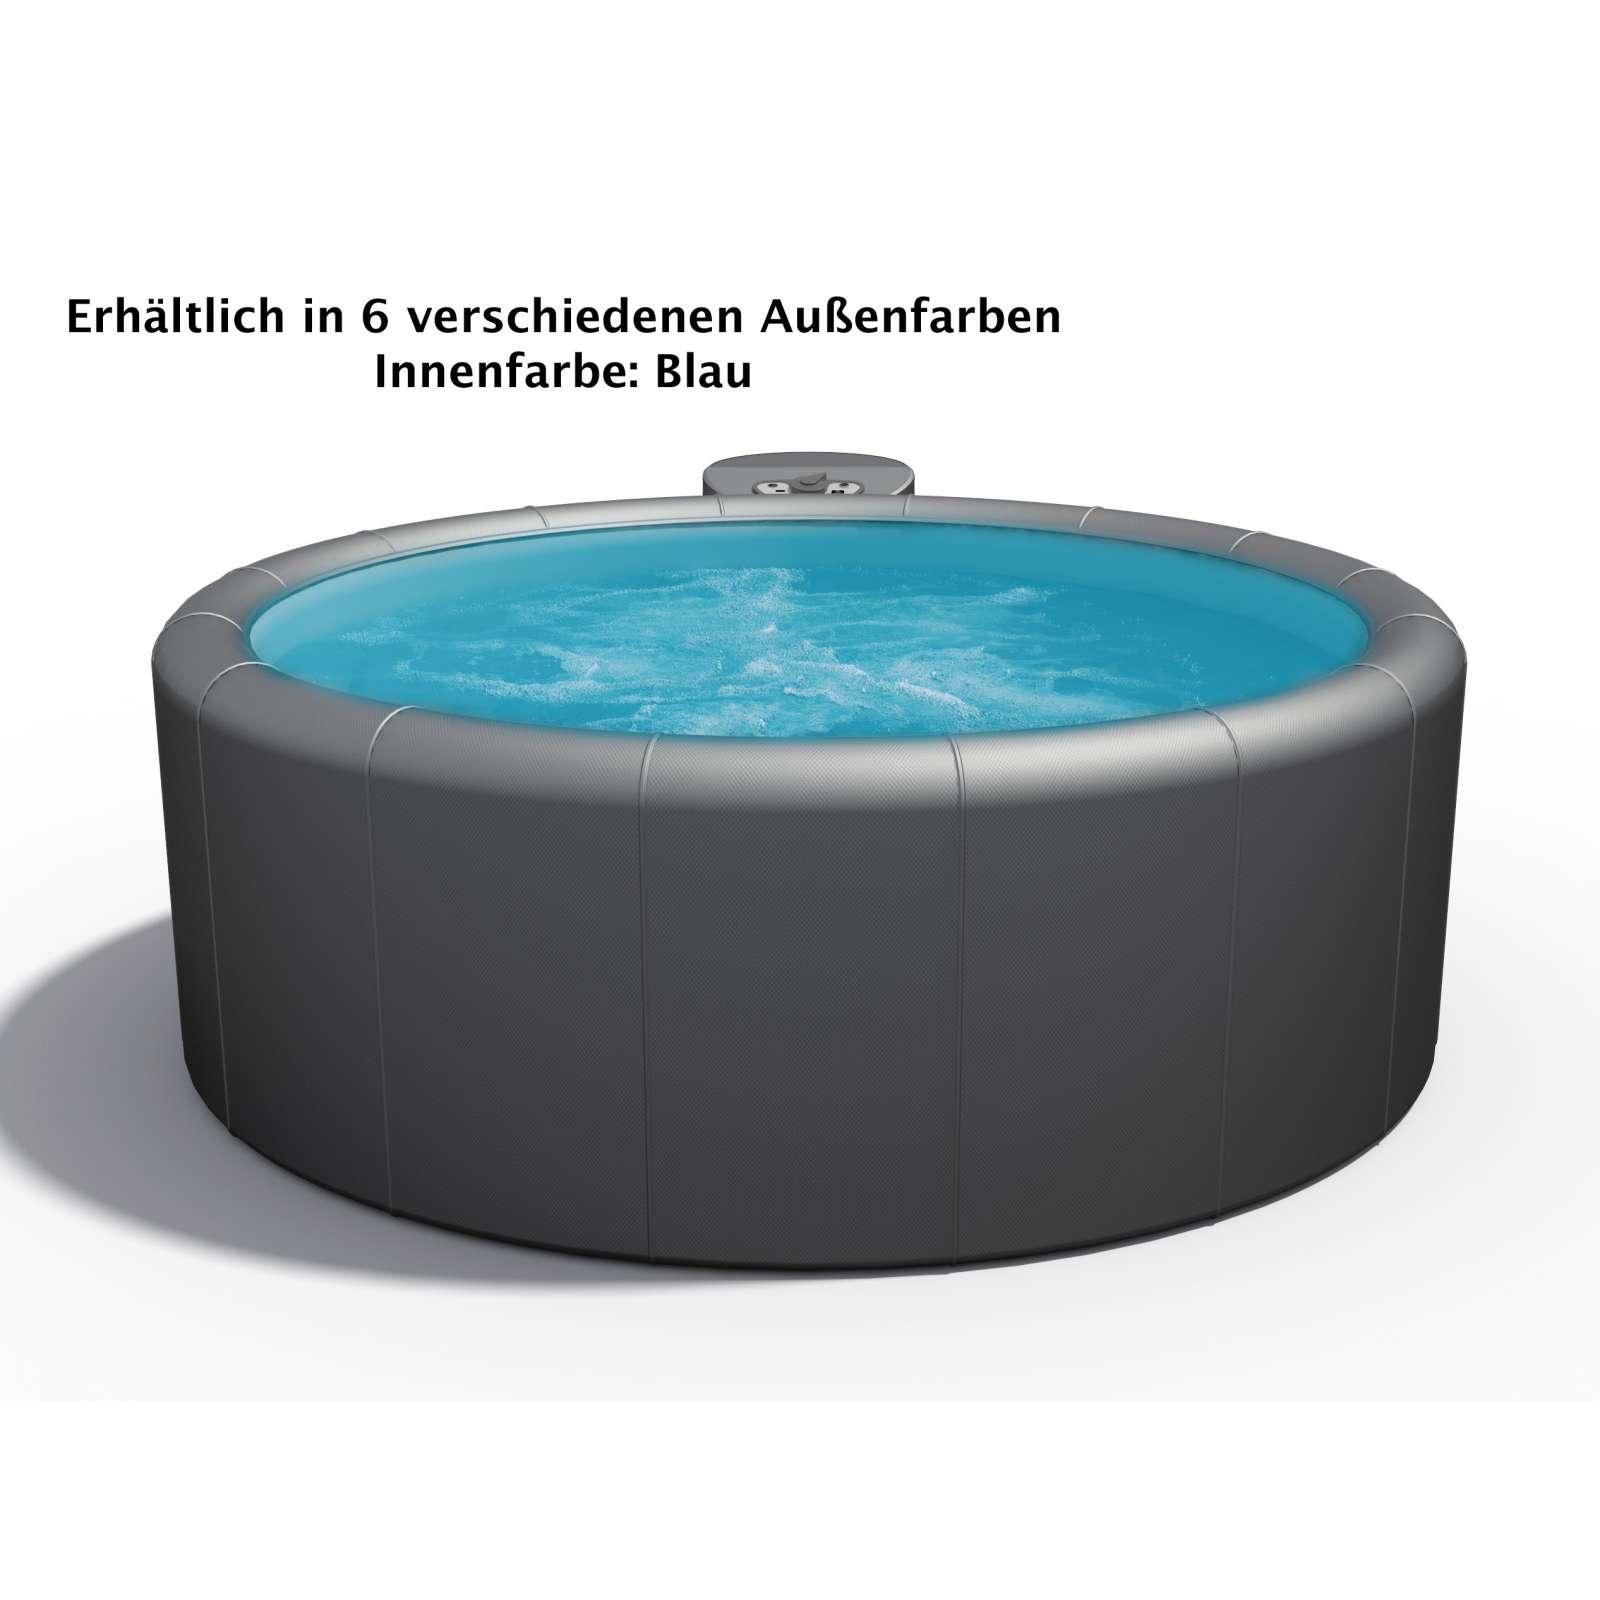 softub whirlpool modell resort 5 bis 6 personen 8. Black Bedroom Furniture Sets. Home Design Ideas